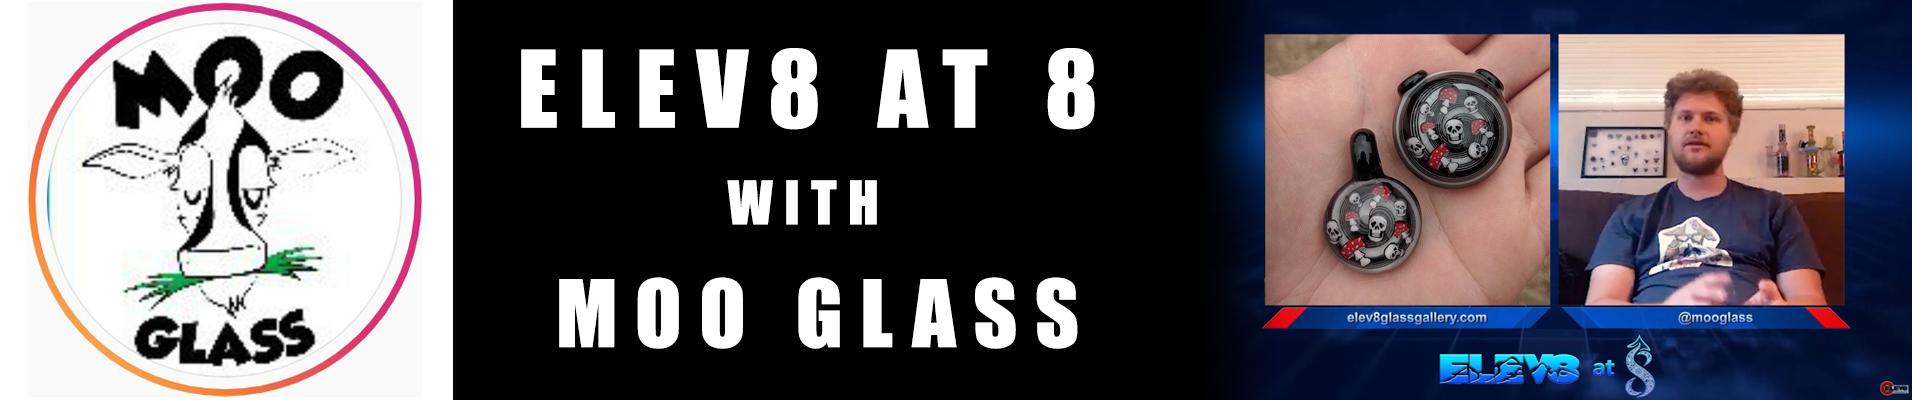 moo-glass-banner.jpg